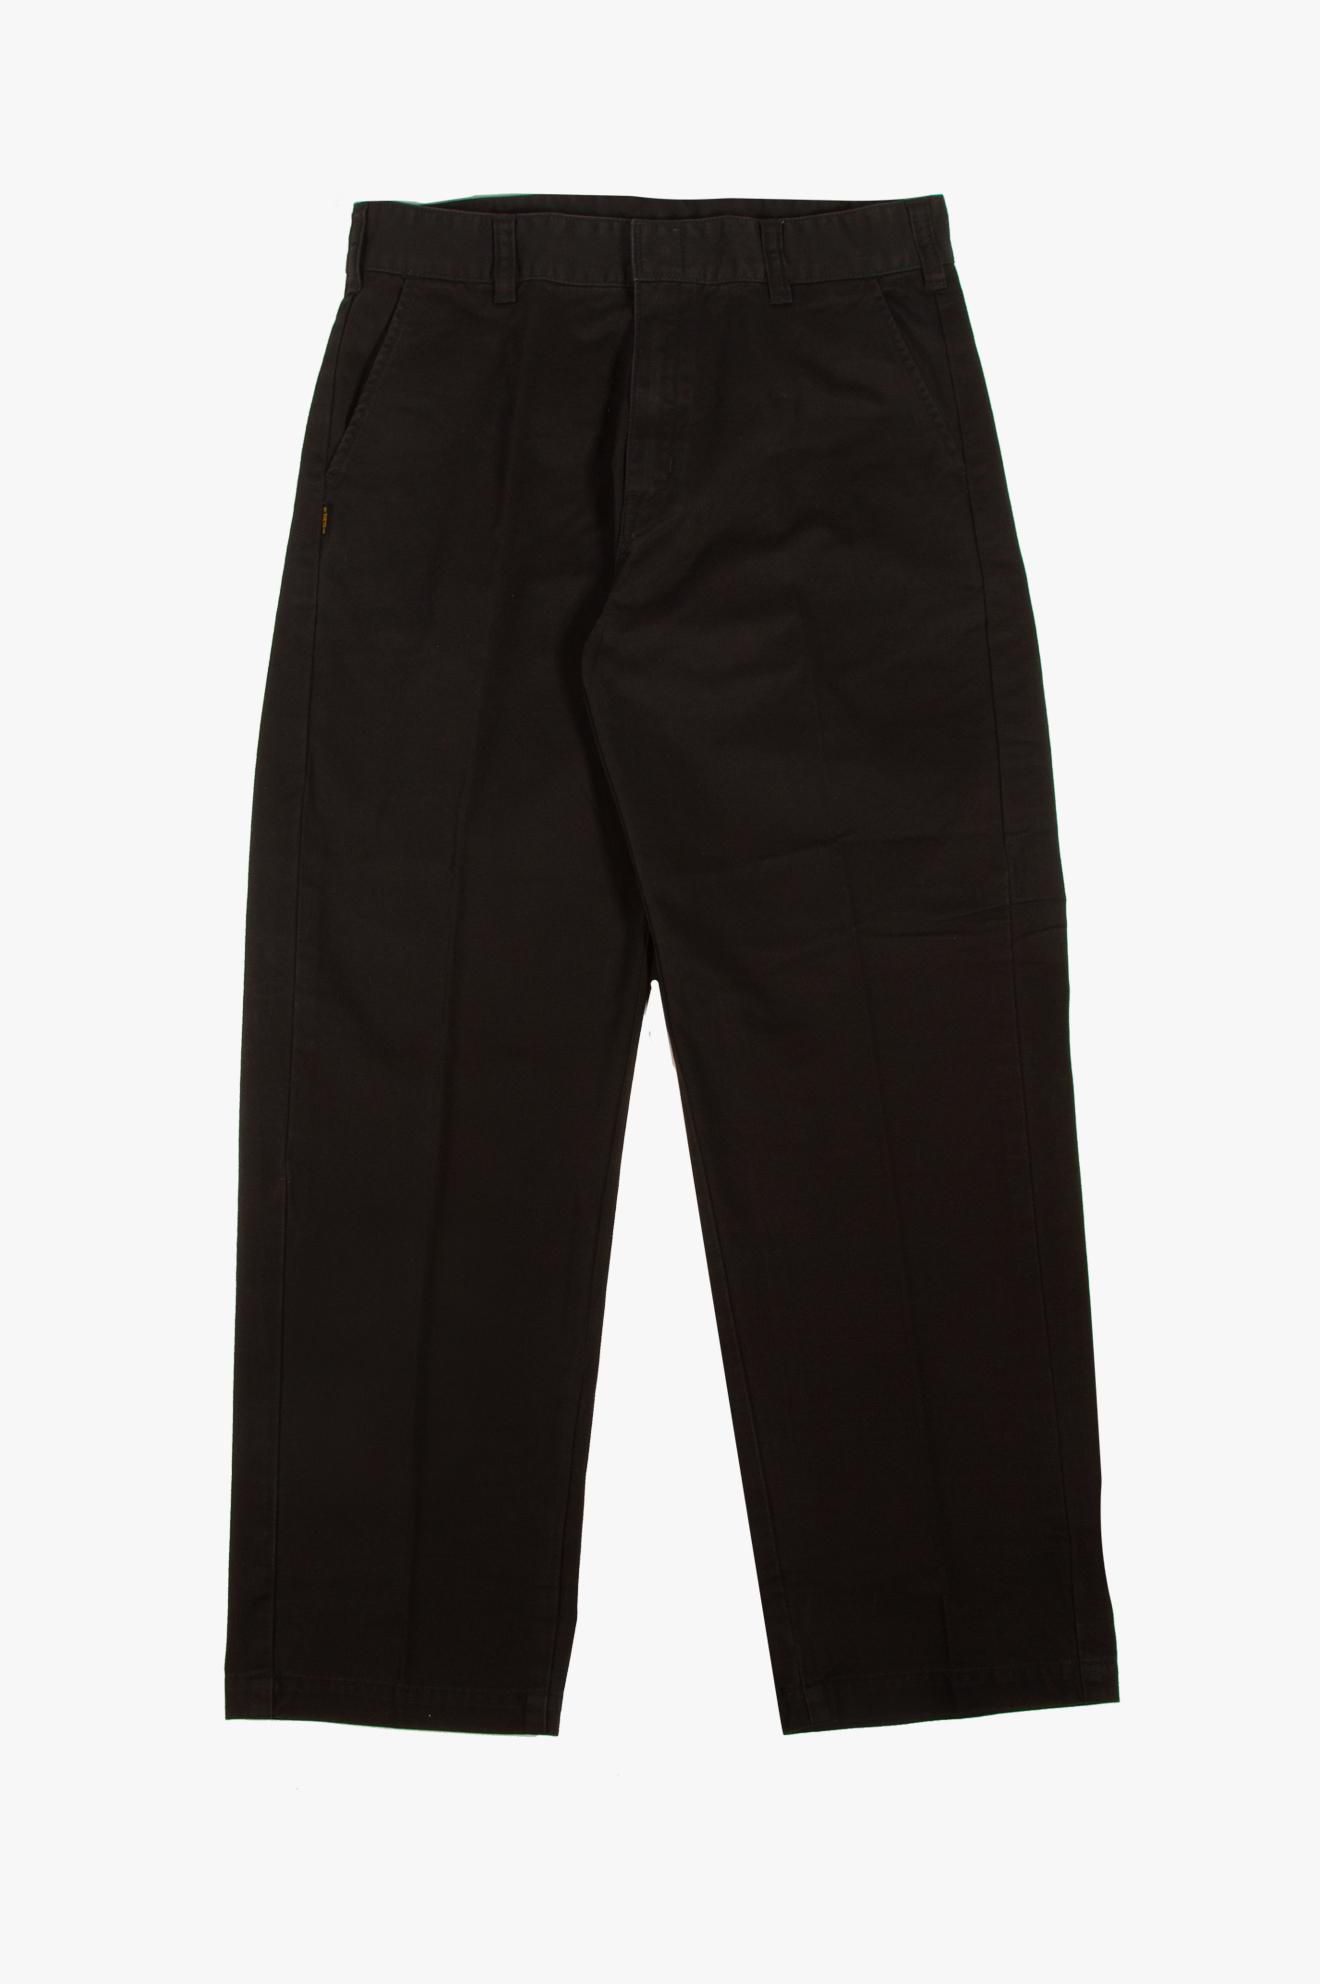 Kendall Basic Chino Pants Black